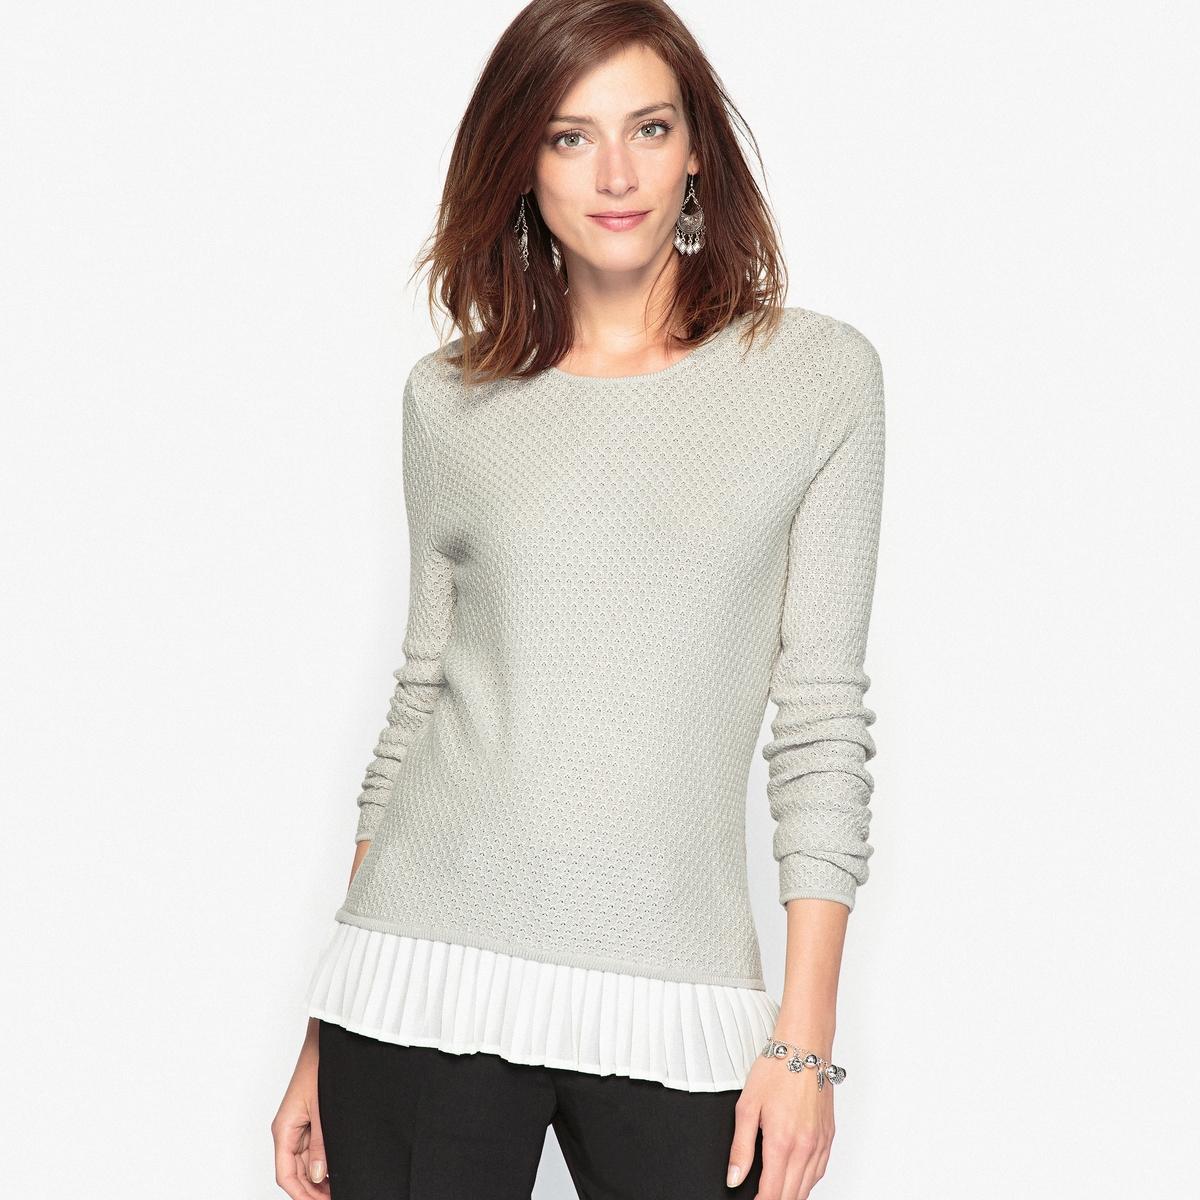 Пуловер из оригинального трикотажа, 10% шерсти